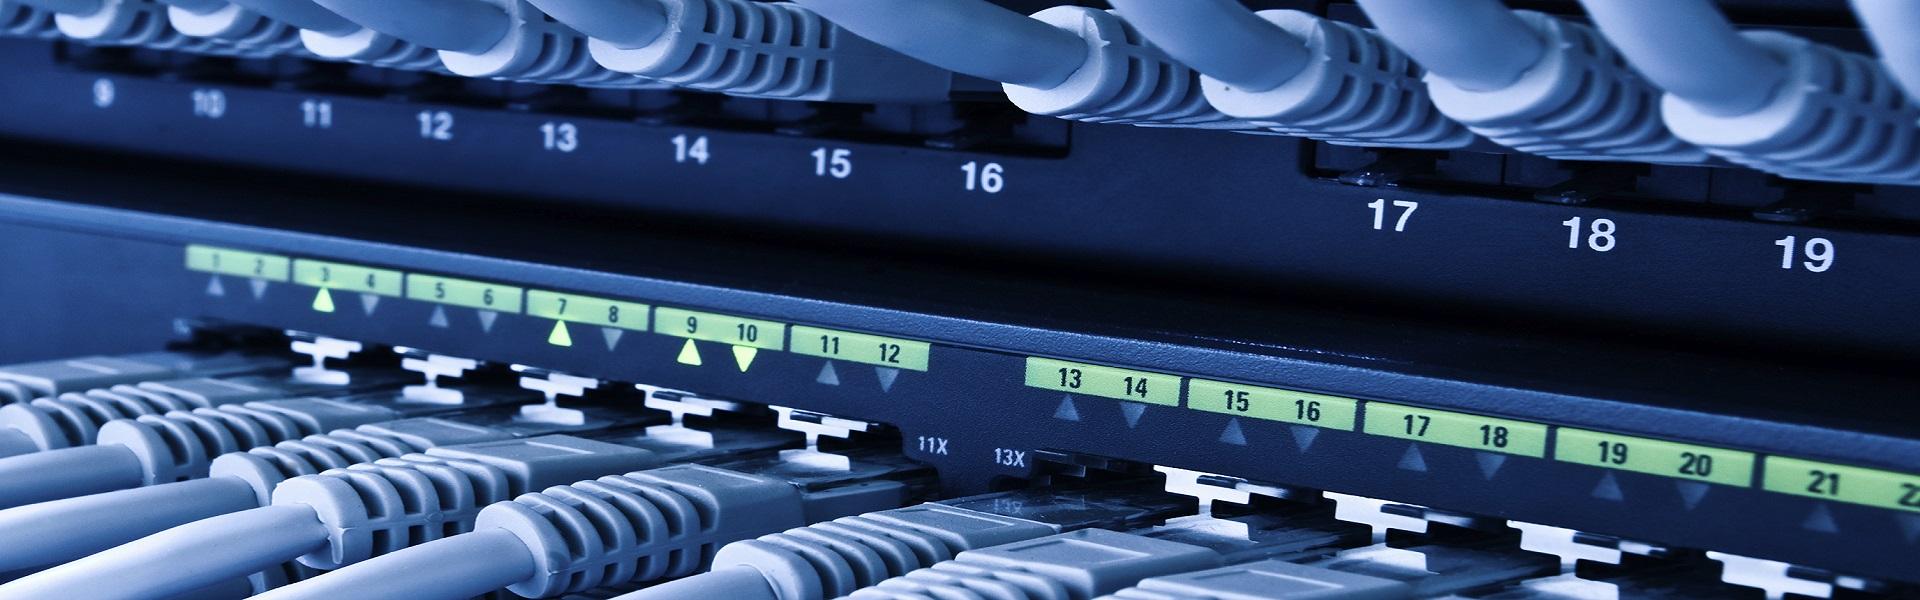 Networking & Communication